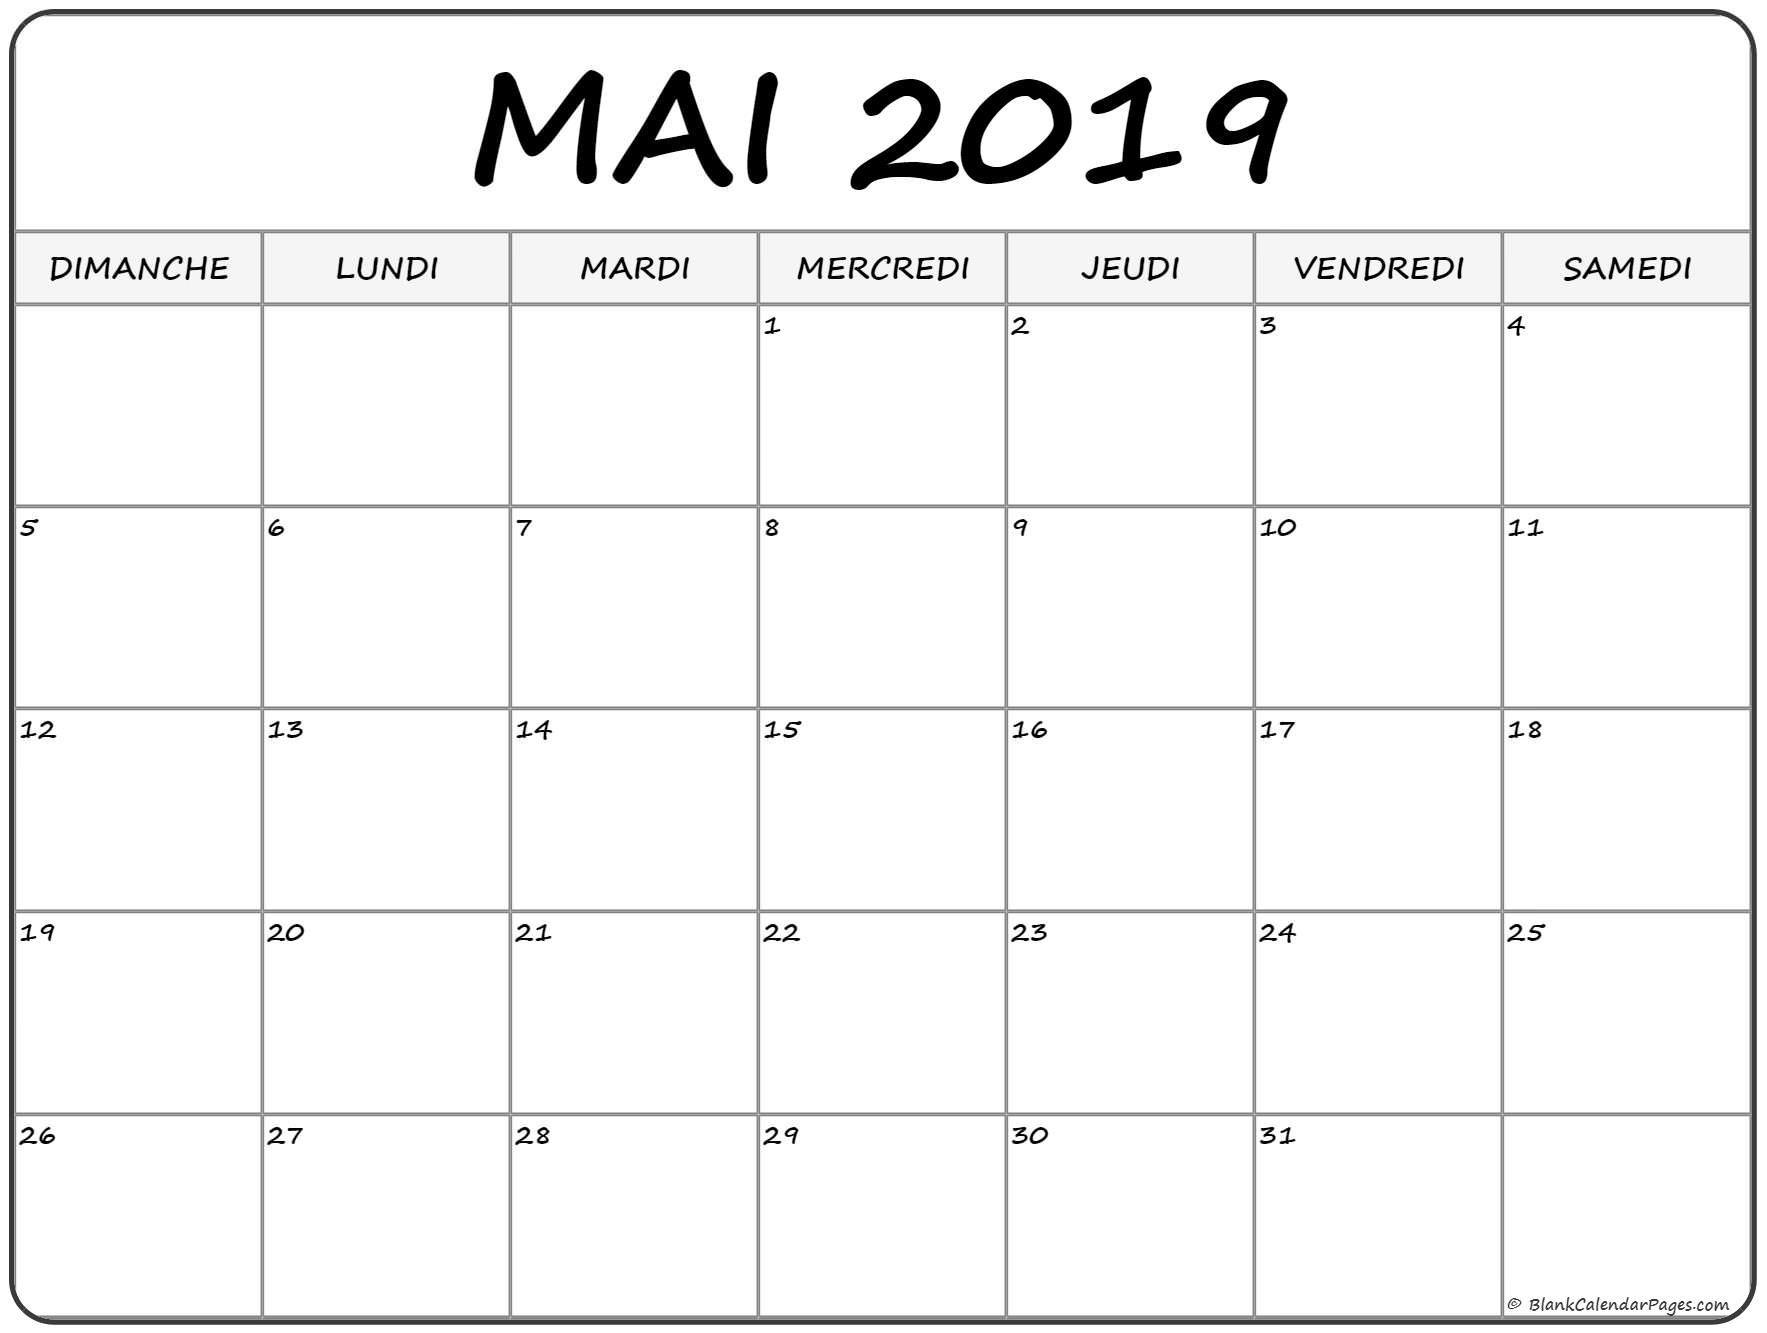 Calendrier Mai2019.Calendrier Mai 2019 Mai Mai2019 Mai2019calendrier 200